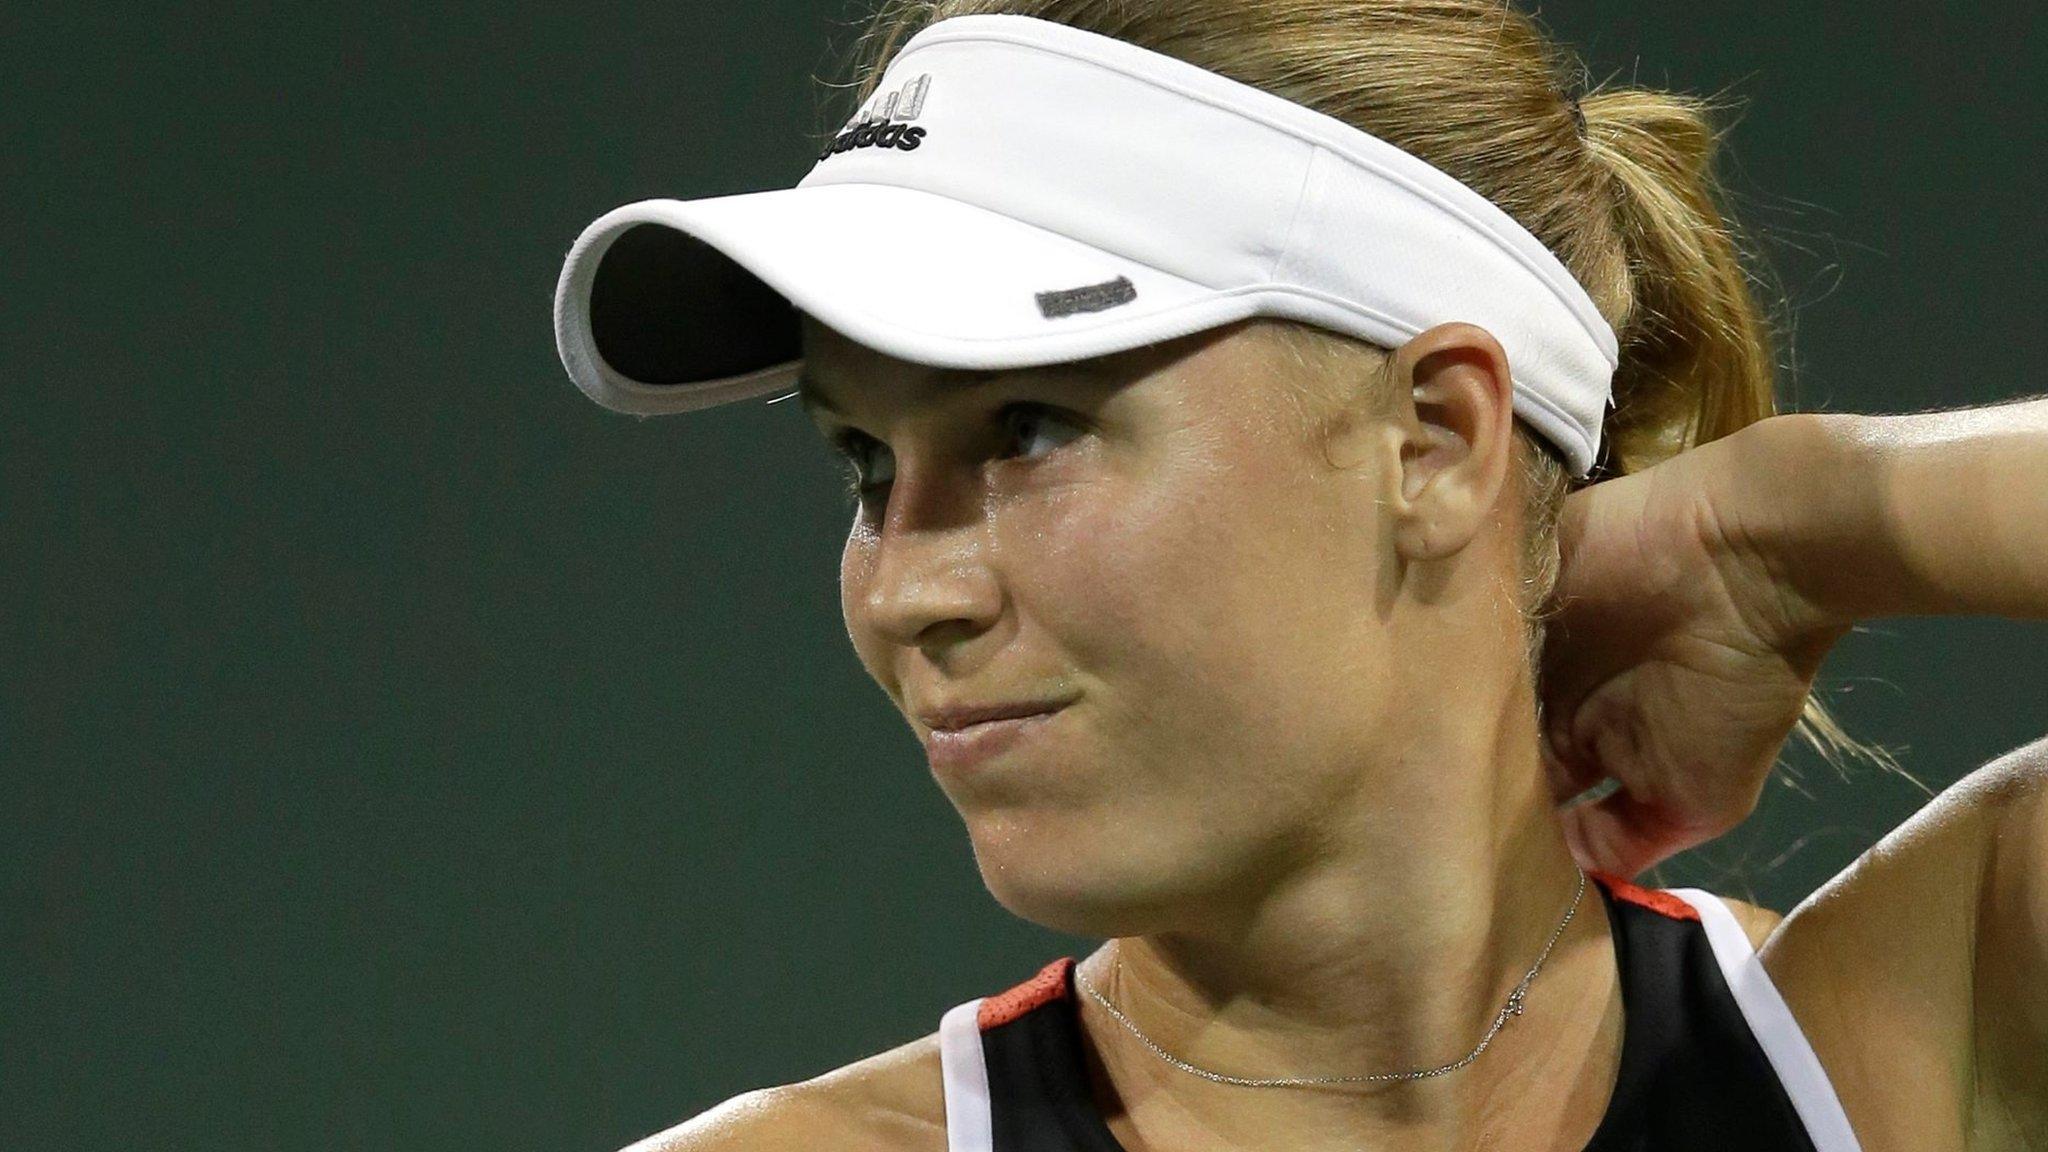 Caroline Wozniacki claims Miami Open fans made death threats in Monica Puig defeat